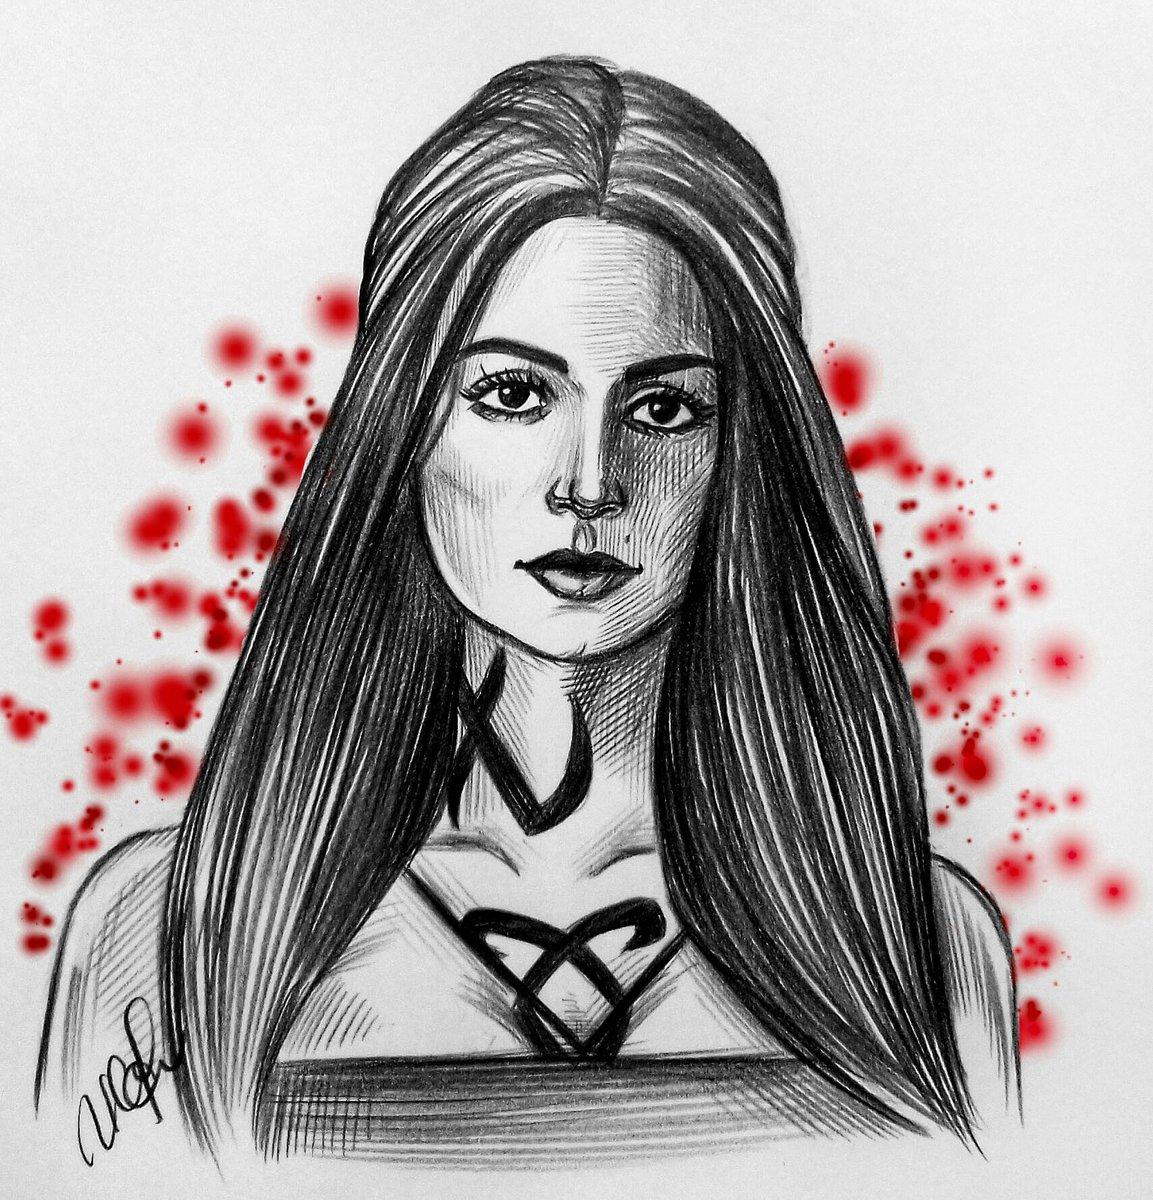 BEAUTIFUL GIRL @EmeraudeToubia  @ShadowhuntersTV  #Shadowhunters #IsabelleLightwood #EmeraudeToubia #FanArt #sketch #art<br>http://pic.twitter.com/6ceXFk3fPU